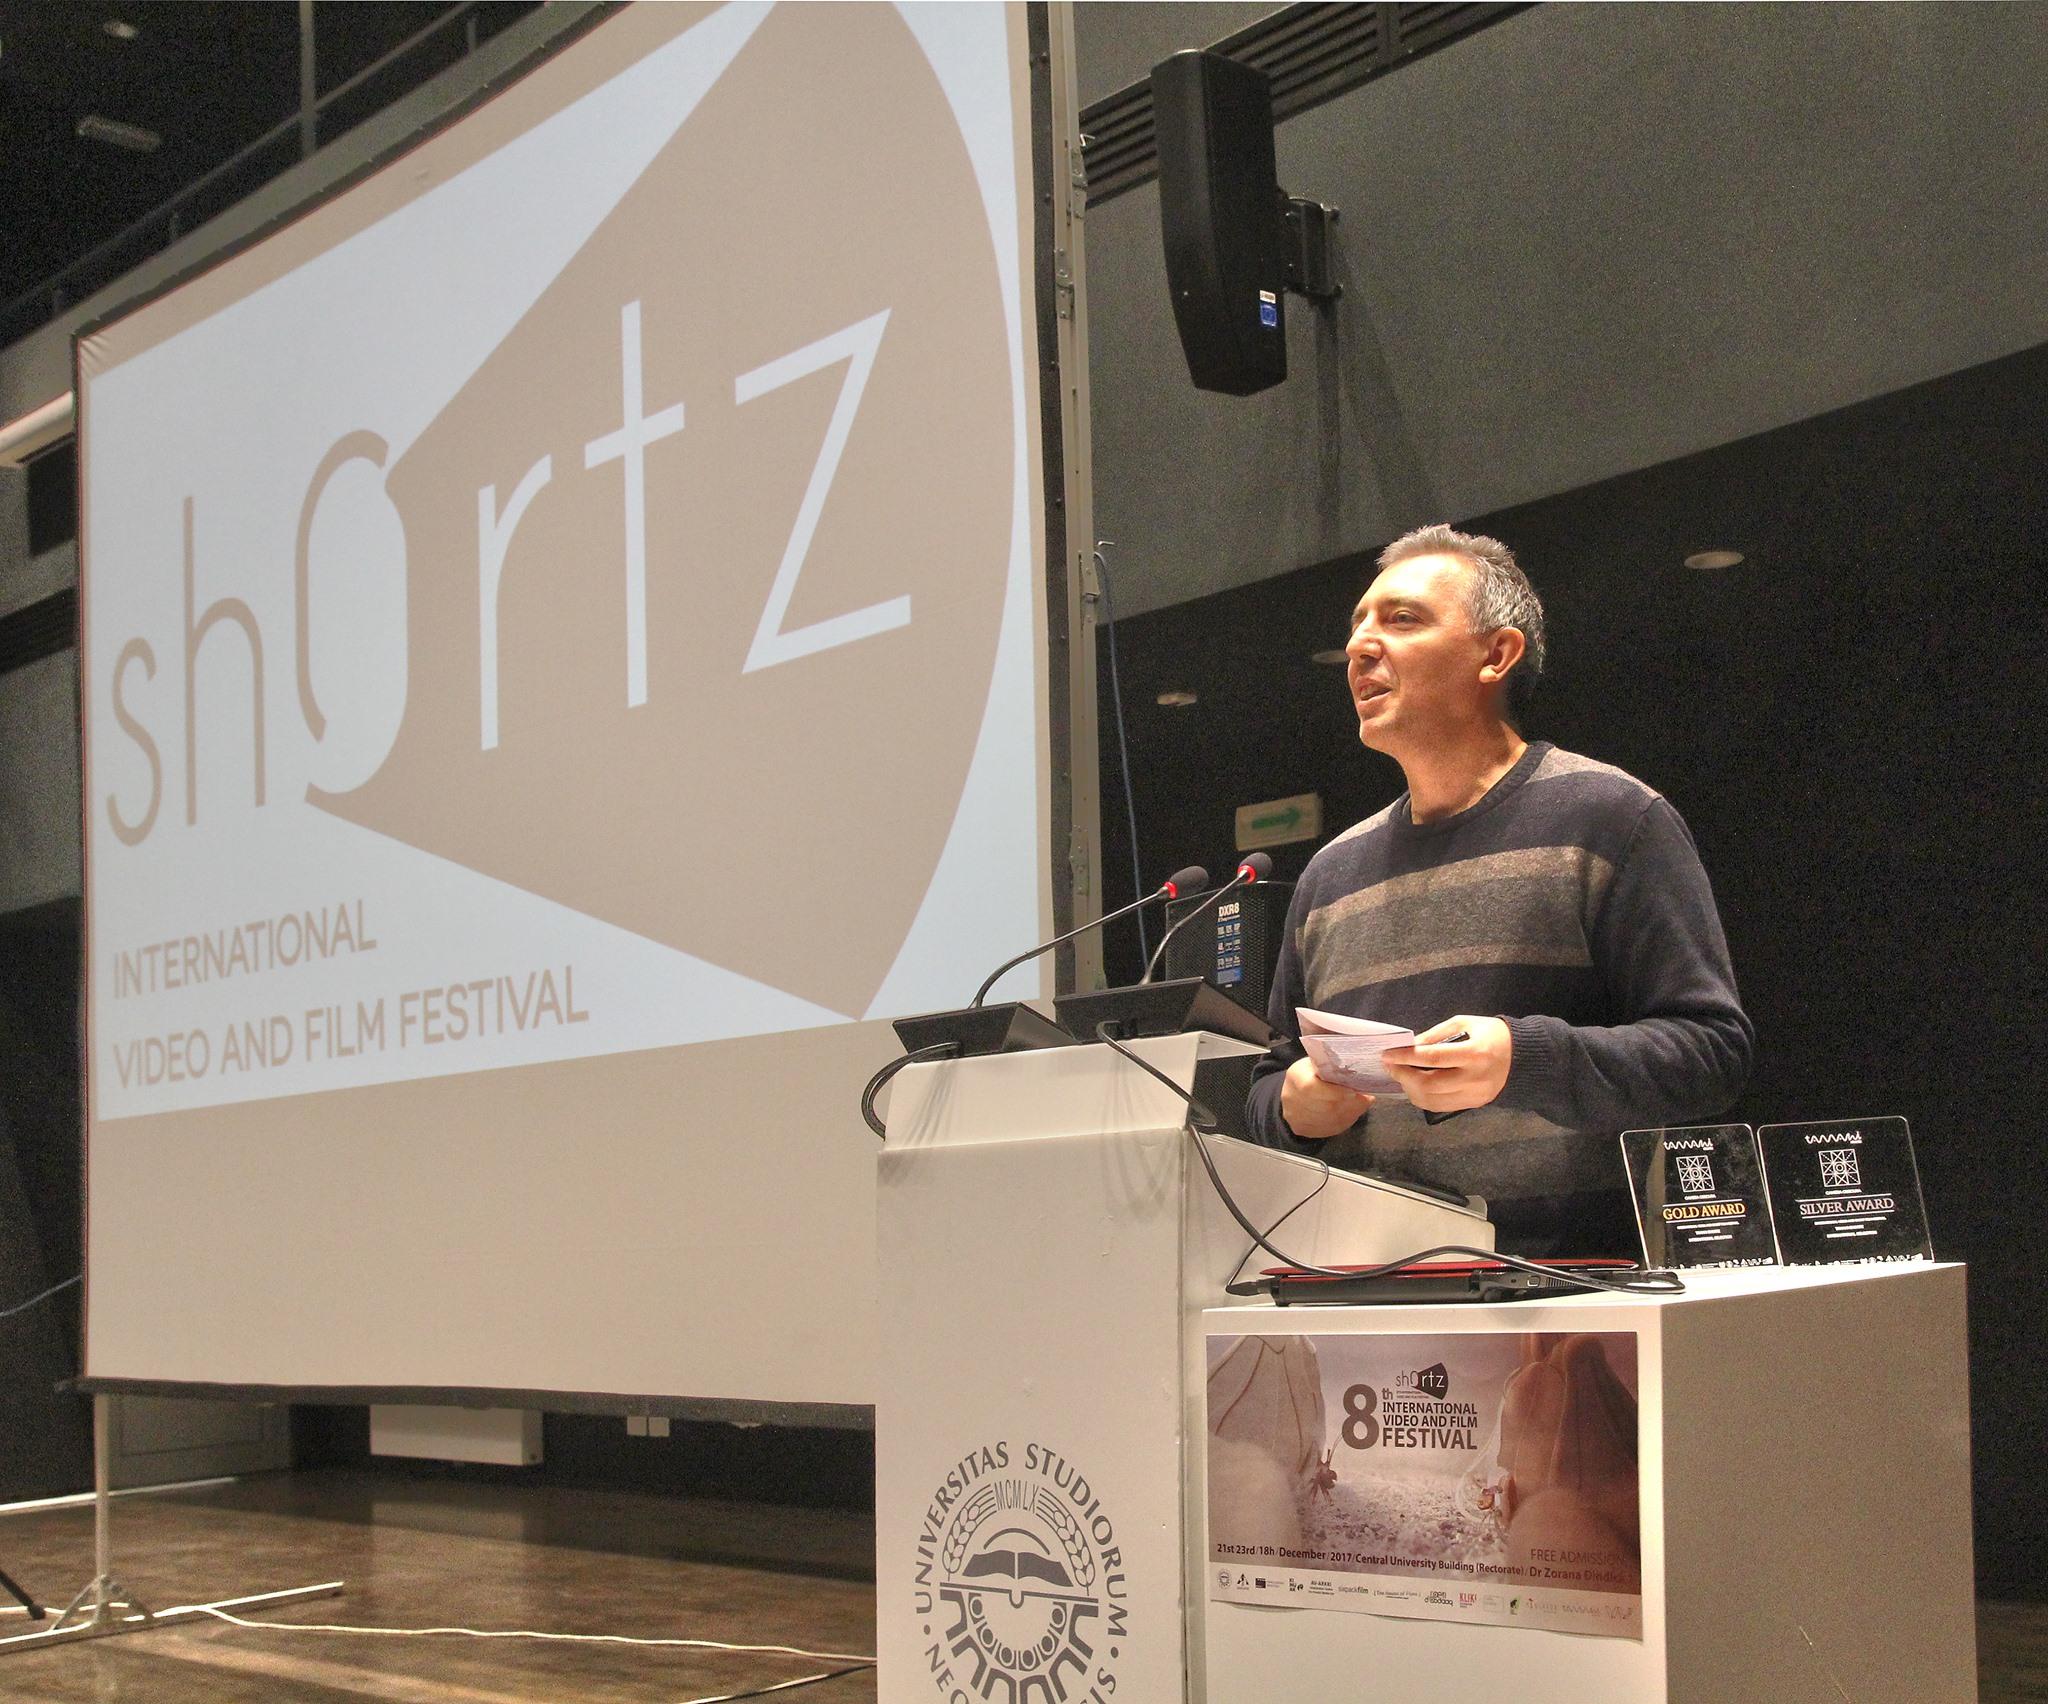 Opening of the Shortz 2017